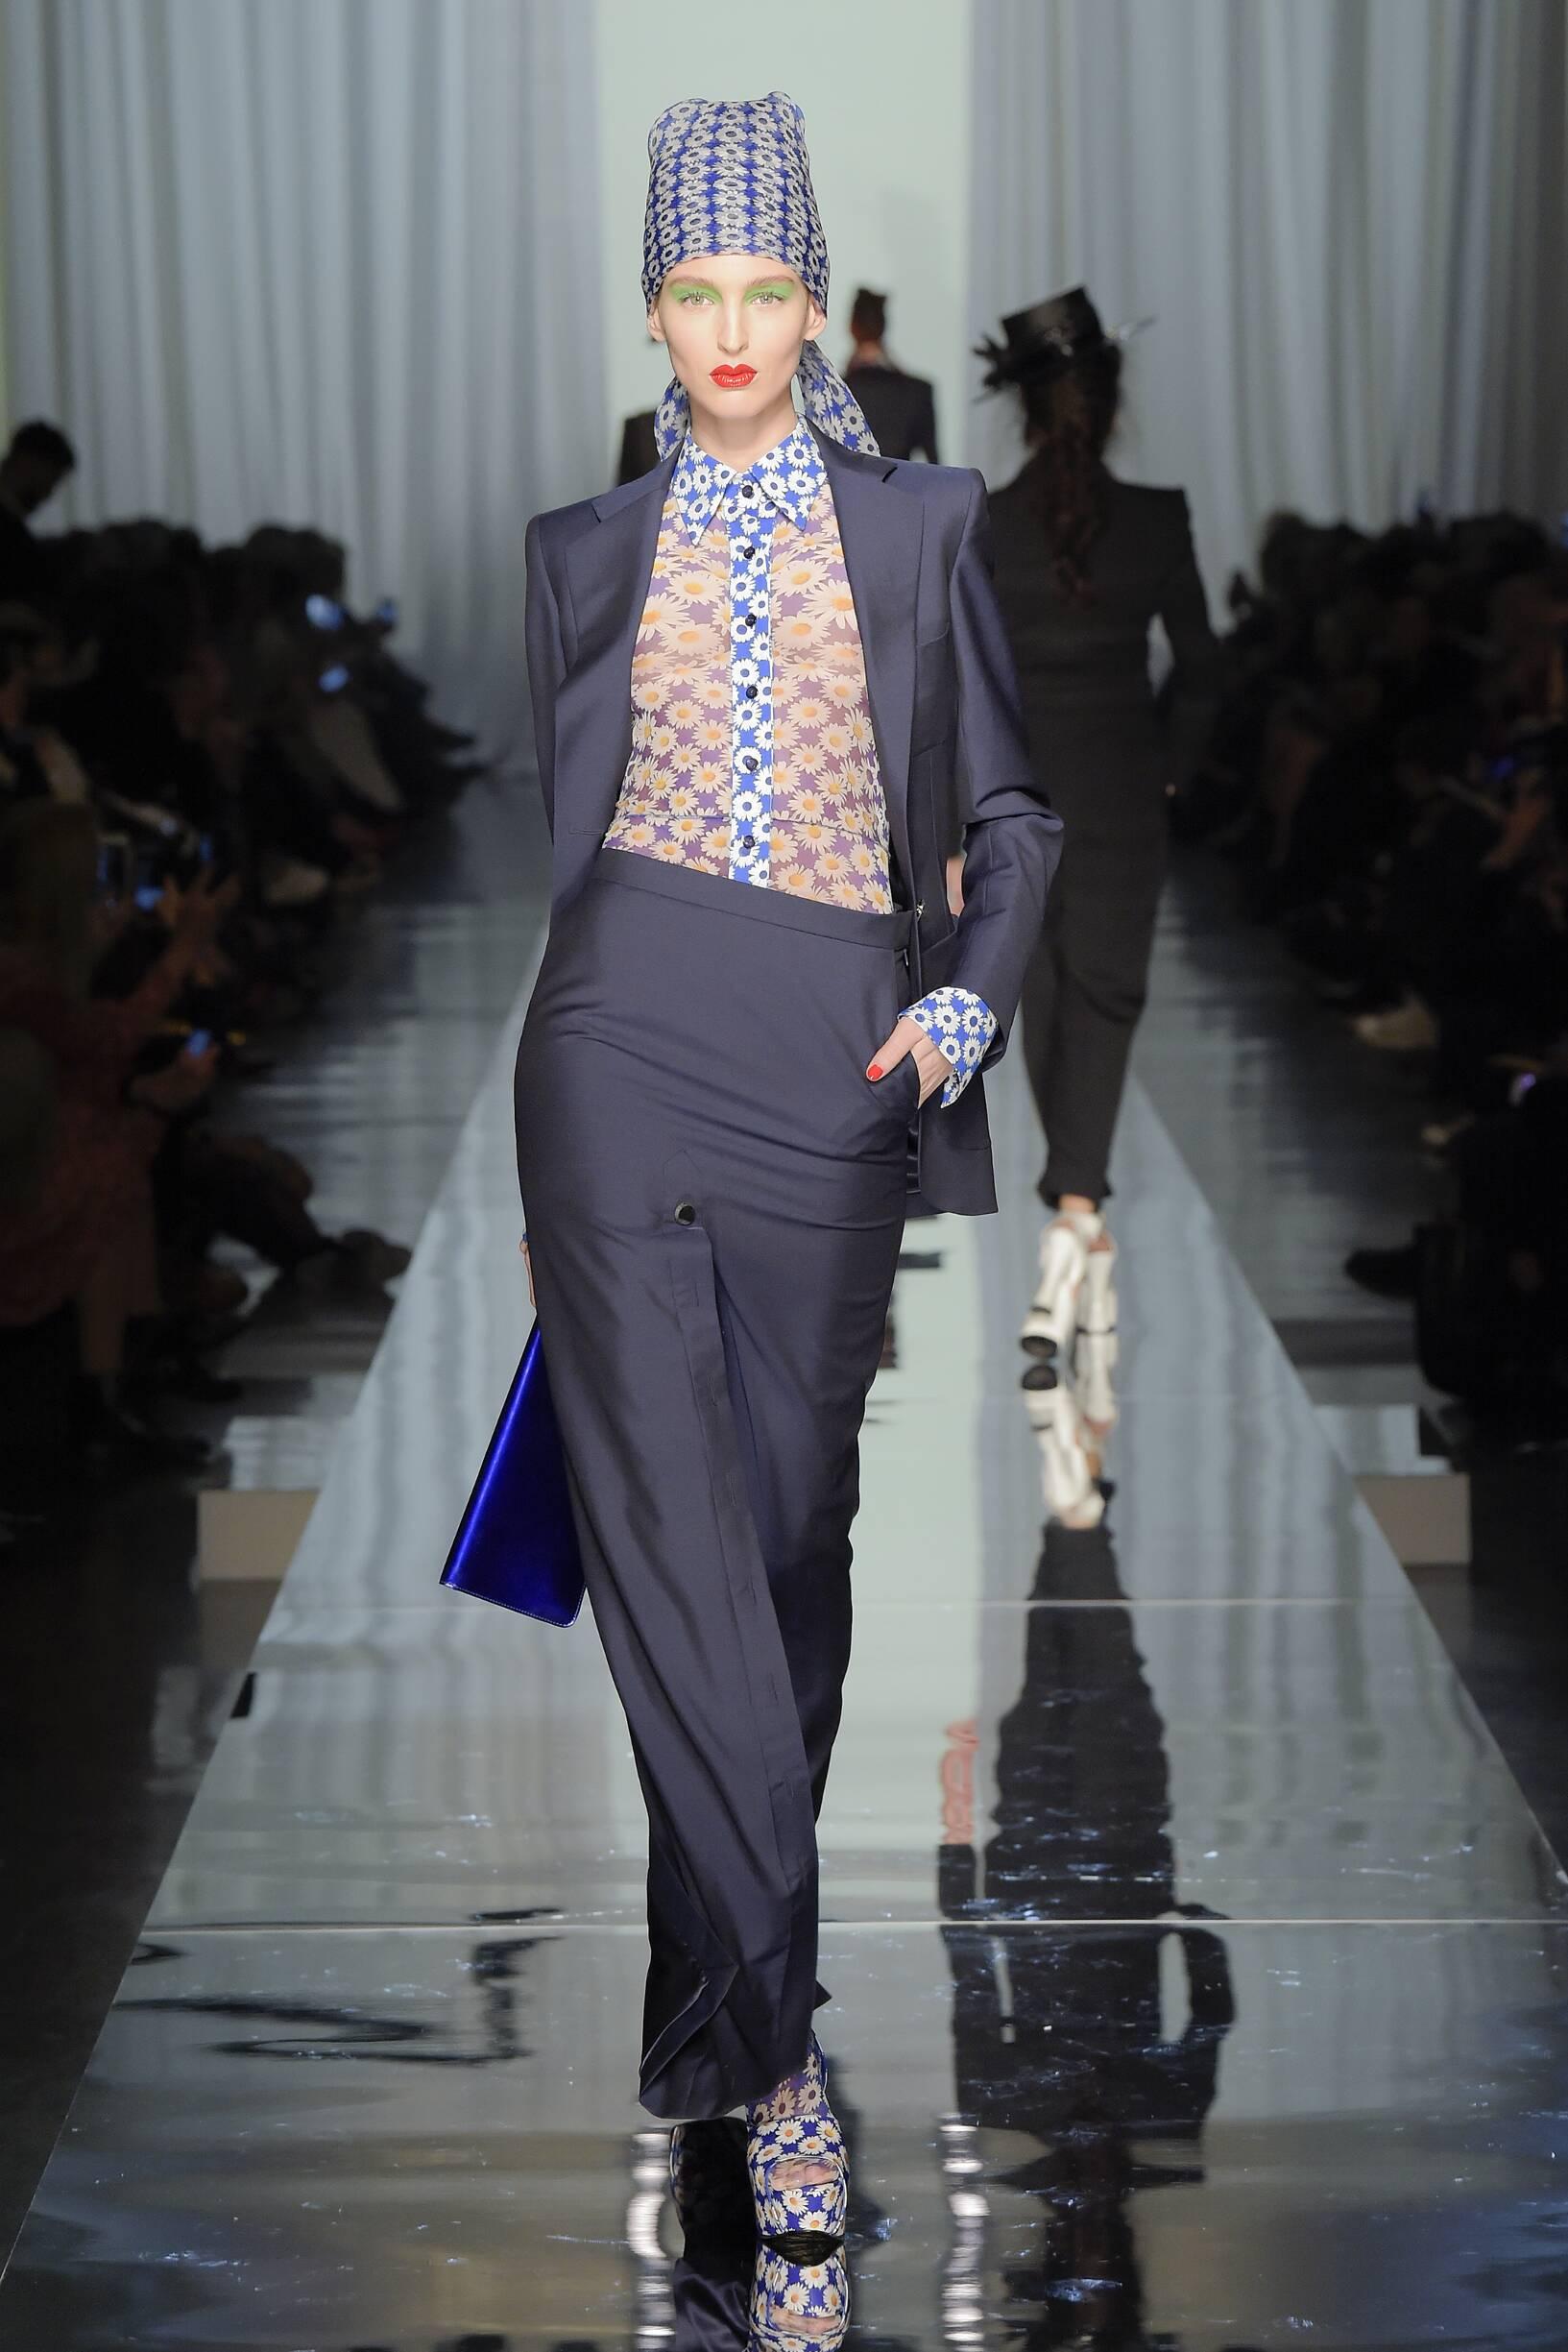 Woman Summer 2017 Fashion Trends Jean Paul Gaultier Haute Couture